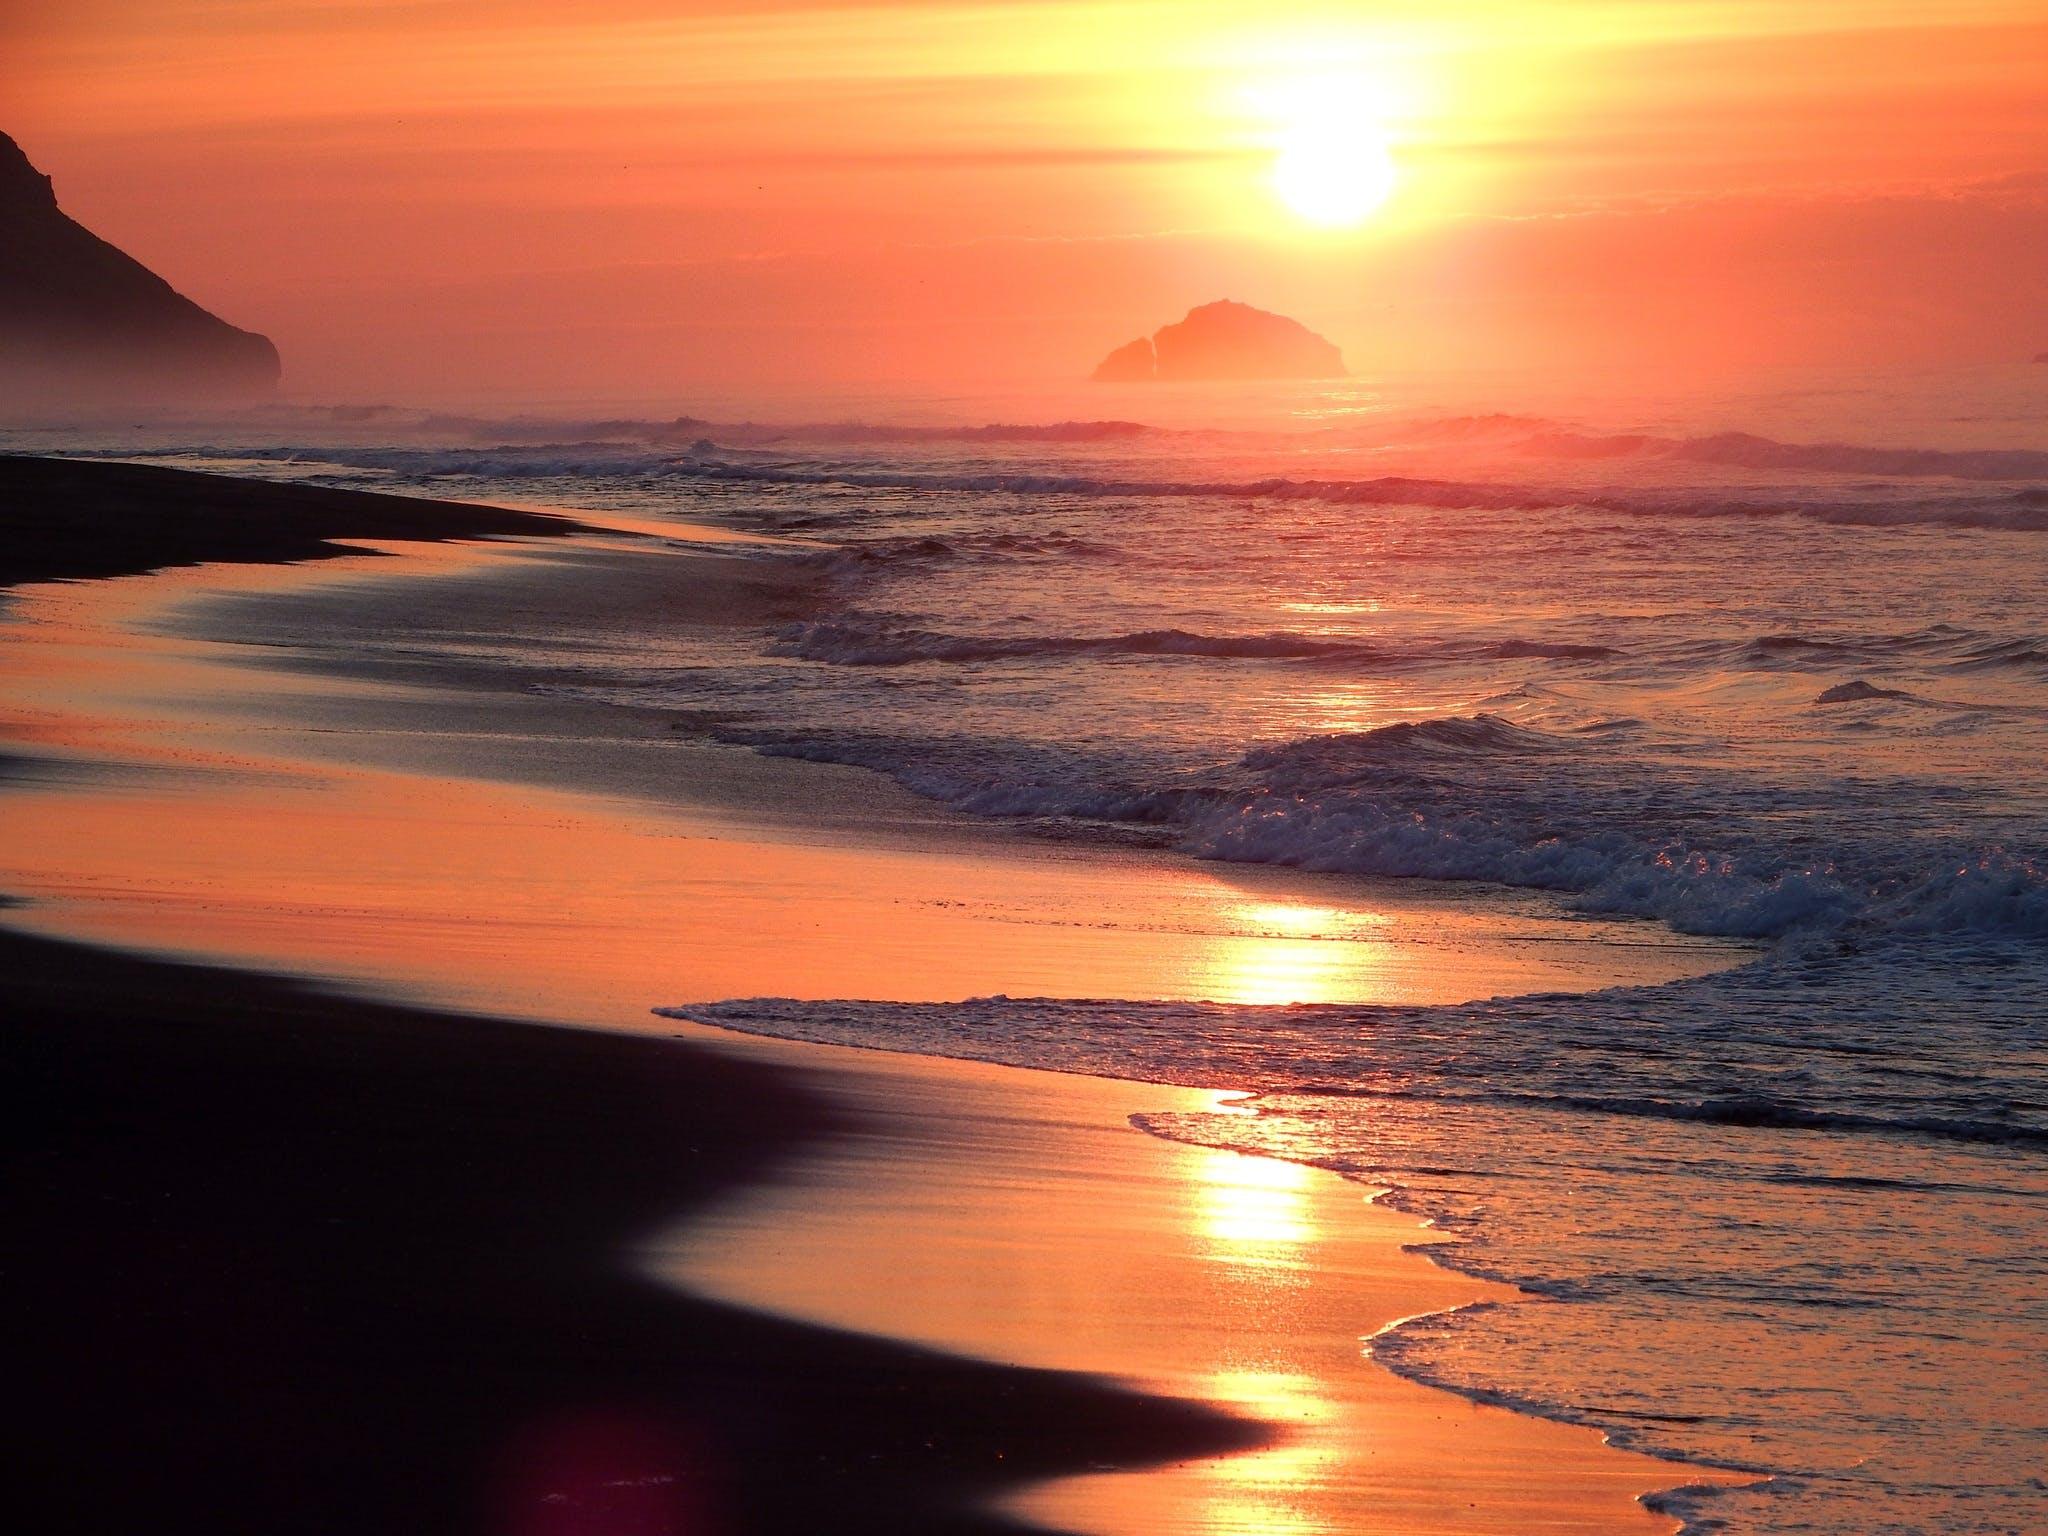 dawn, dusk, nature